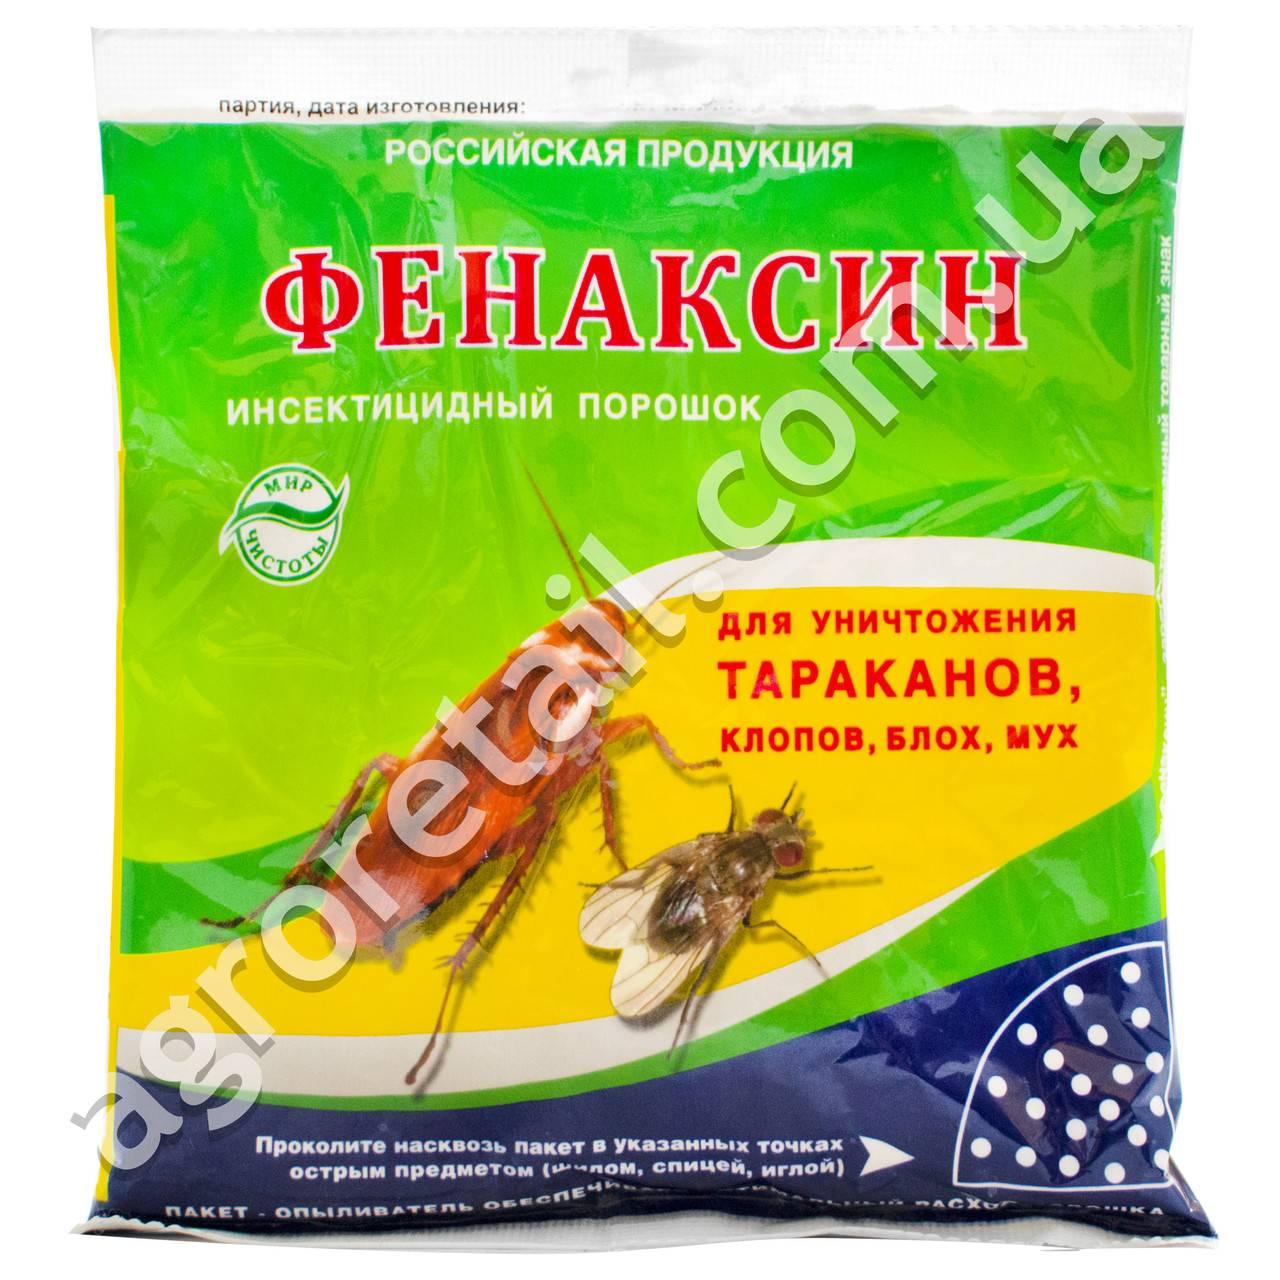 Фенаксин от тараканов и клопов: инструкция по применению